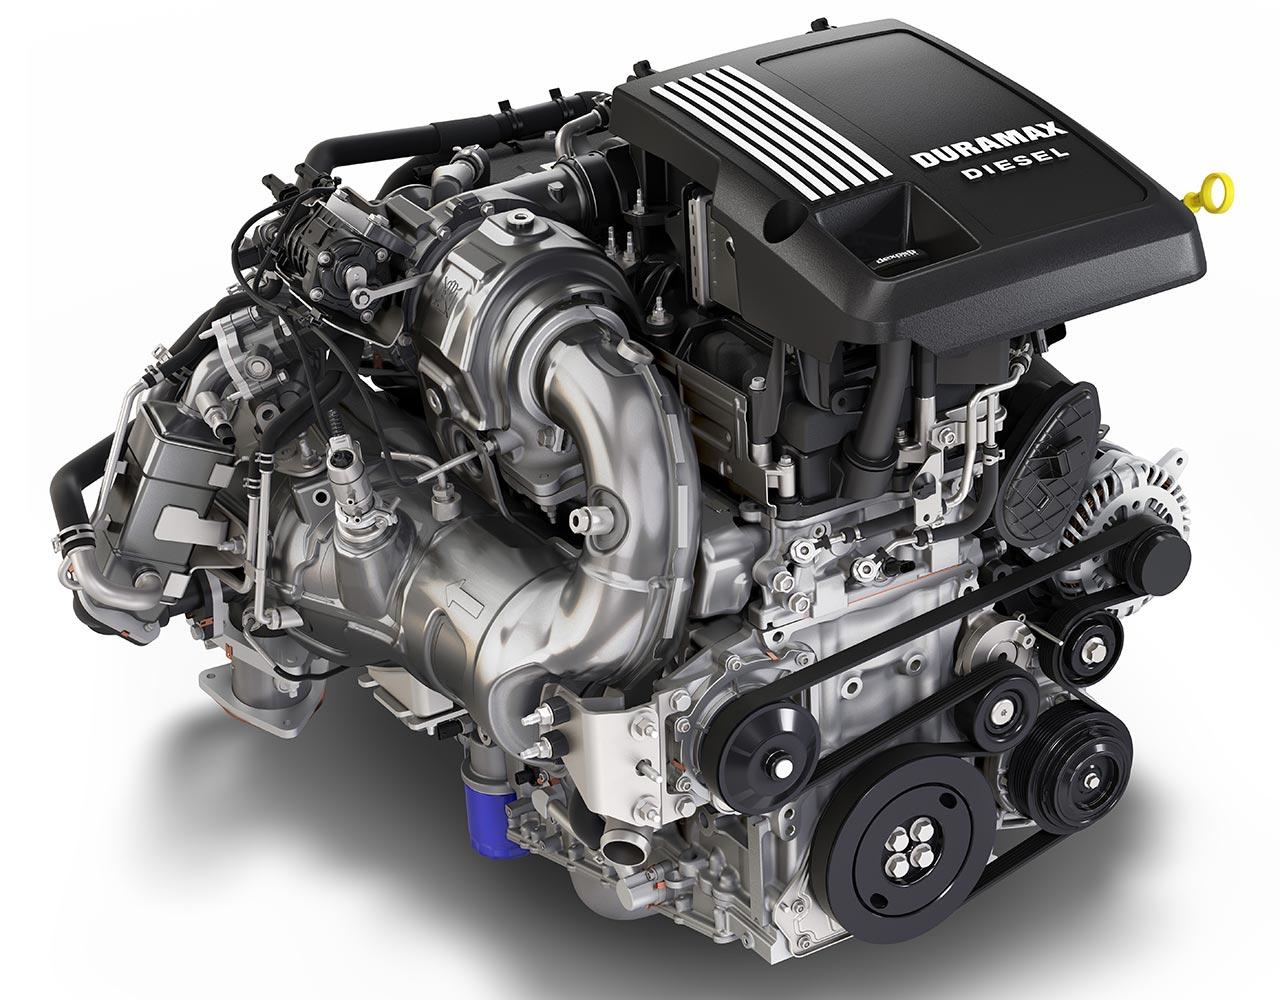 Motor Duramax Chevrolet Silverado LTZ 2020